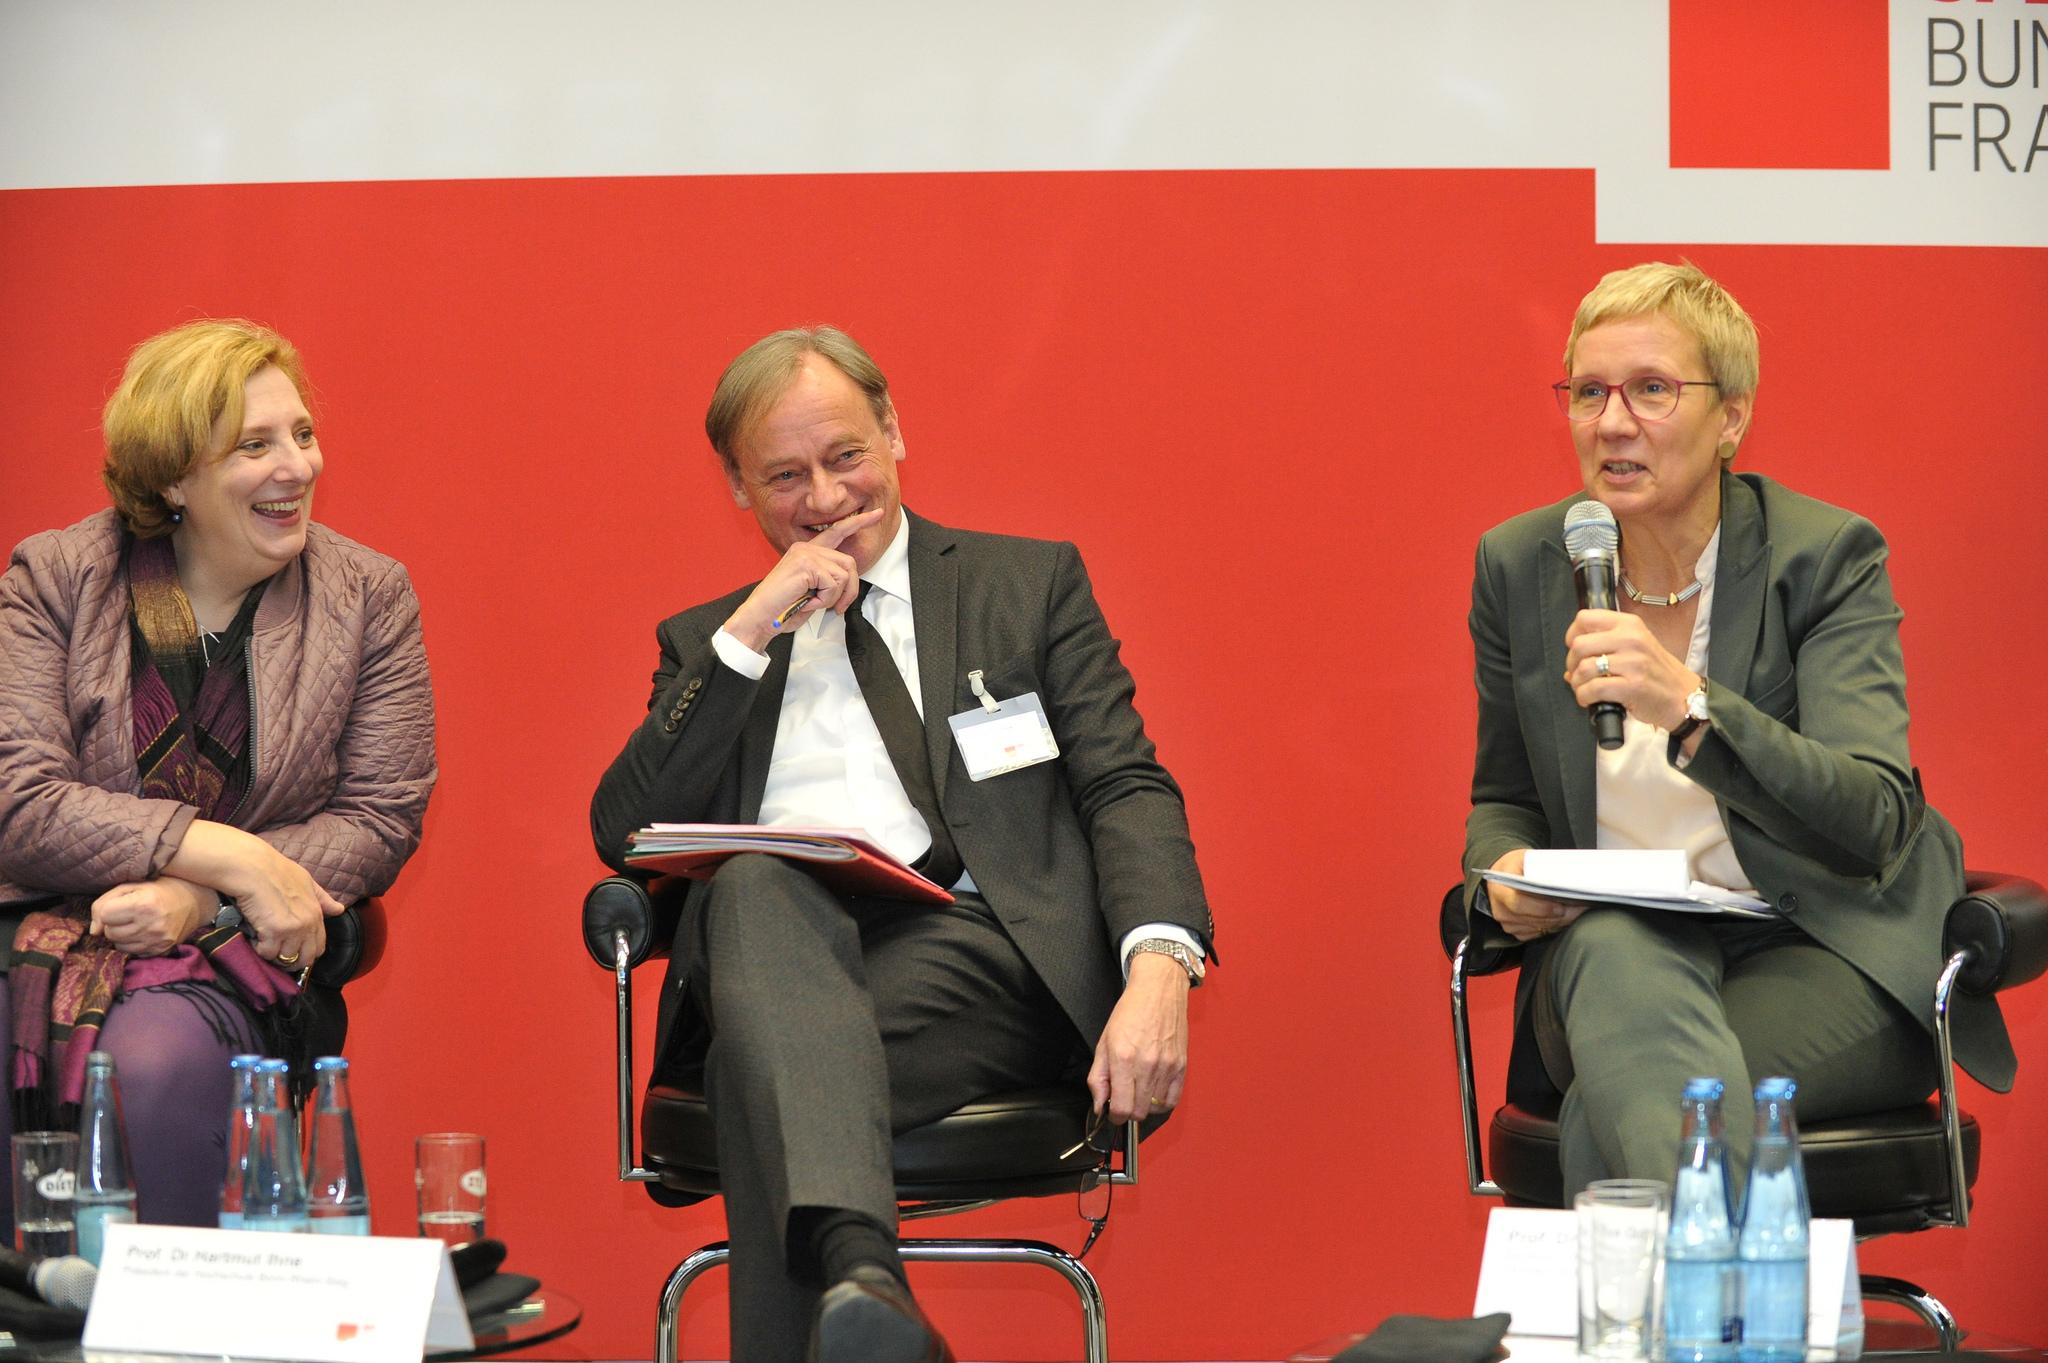 Dr. Daniela De Ridder, Harmut Ihne und Eva Quante-Brandt (Foto: Andreas Amann)